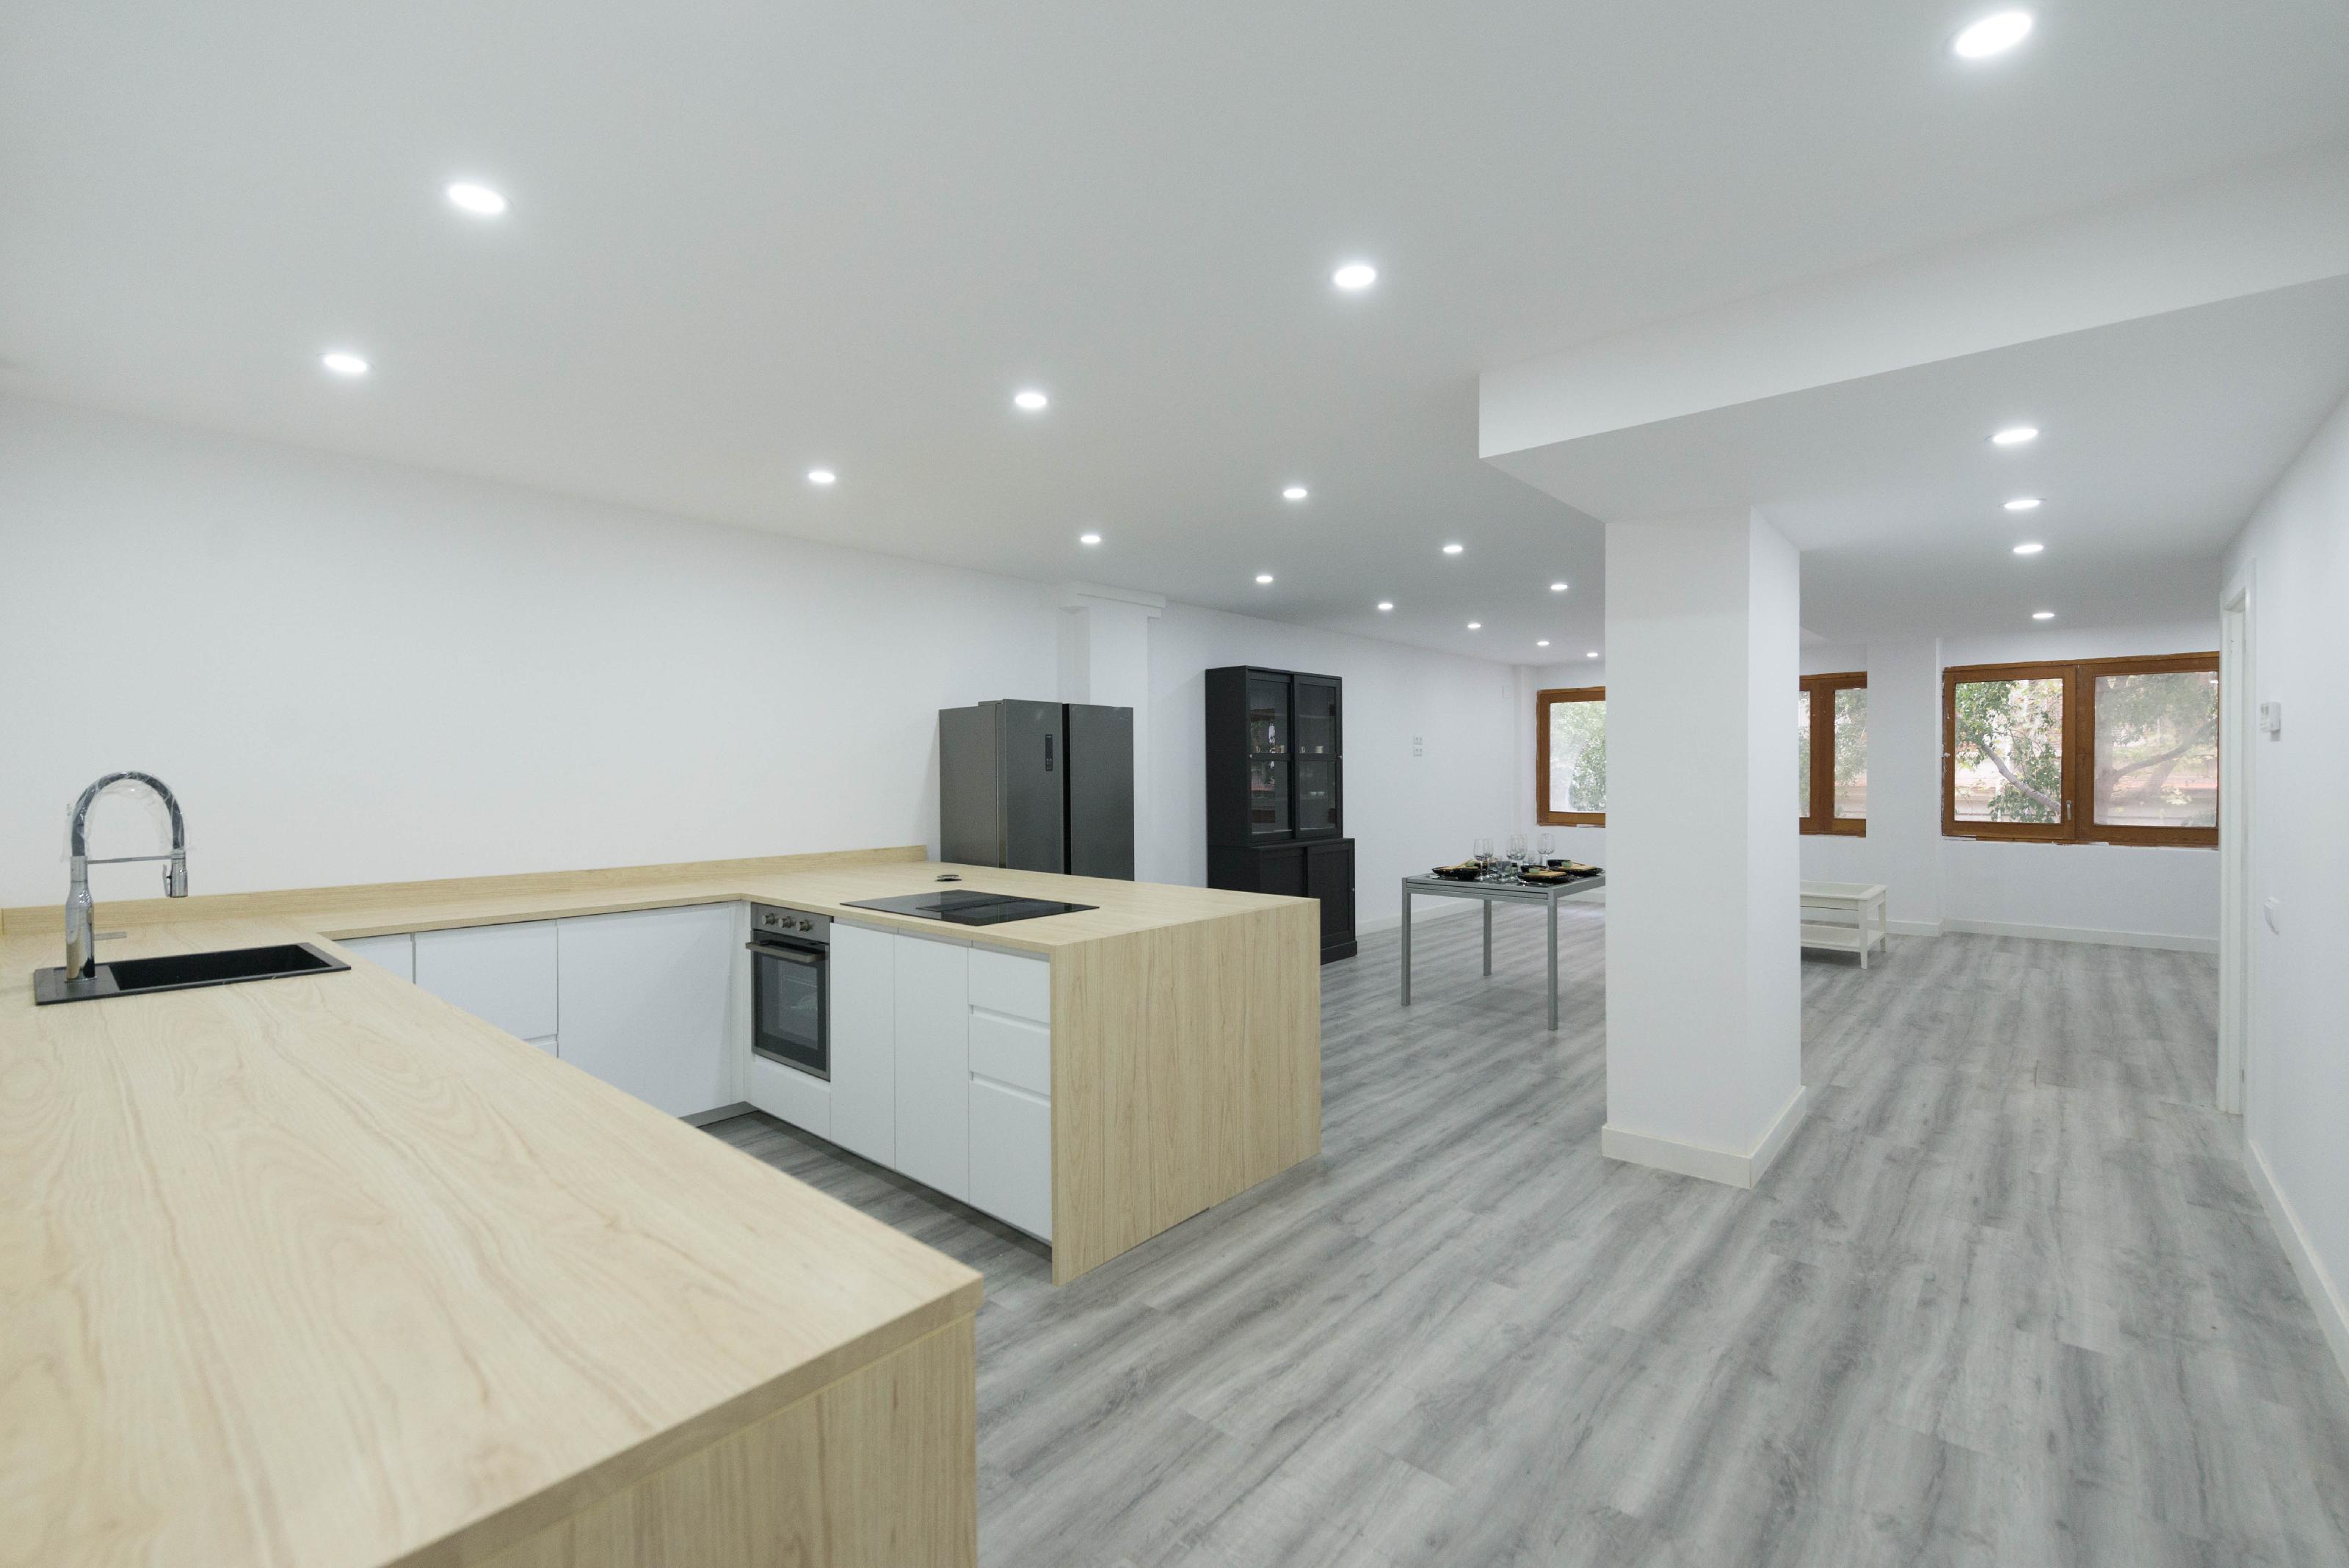 242980 Flat for sale in Eixample, Sagrada Familia 1